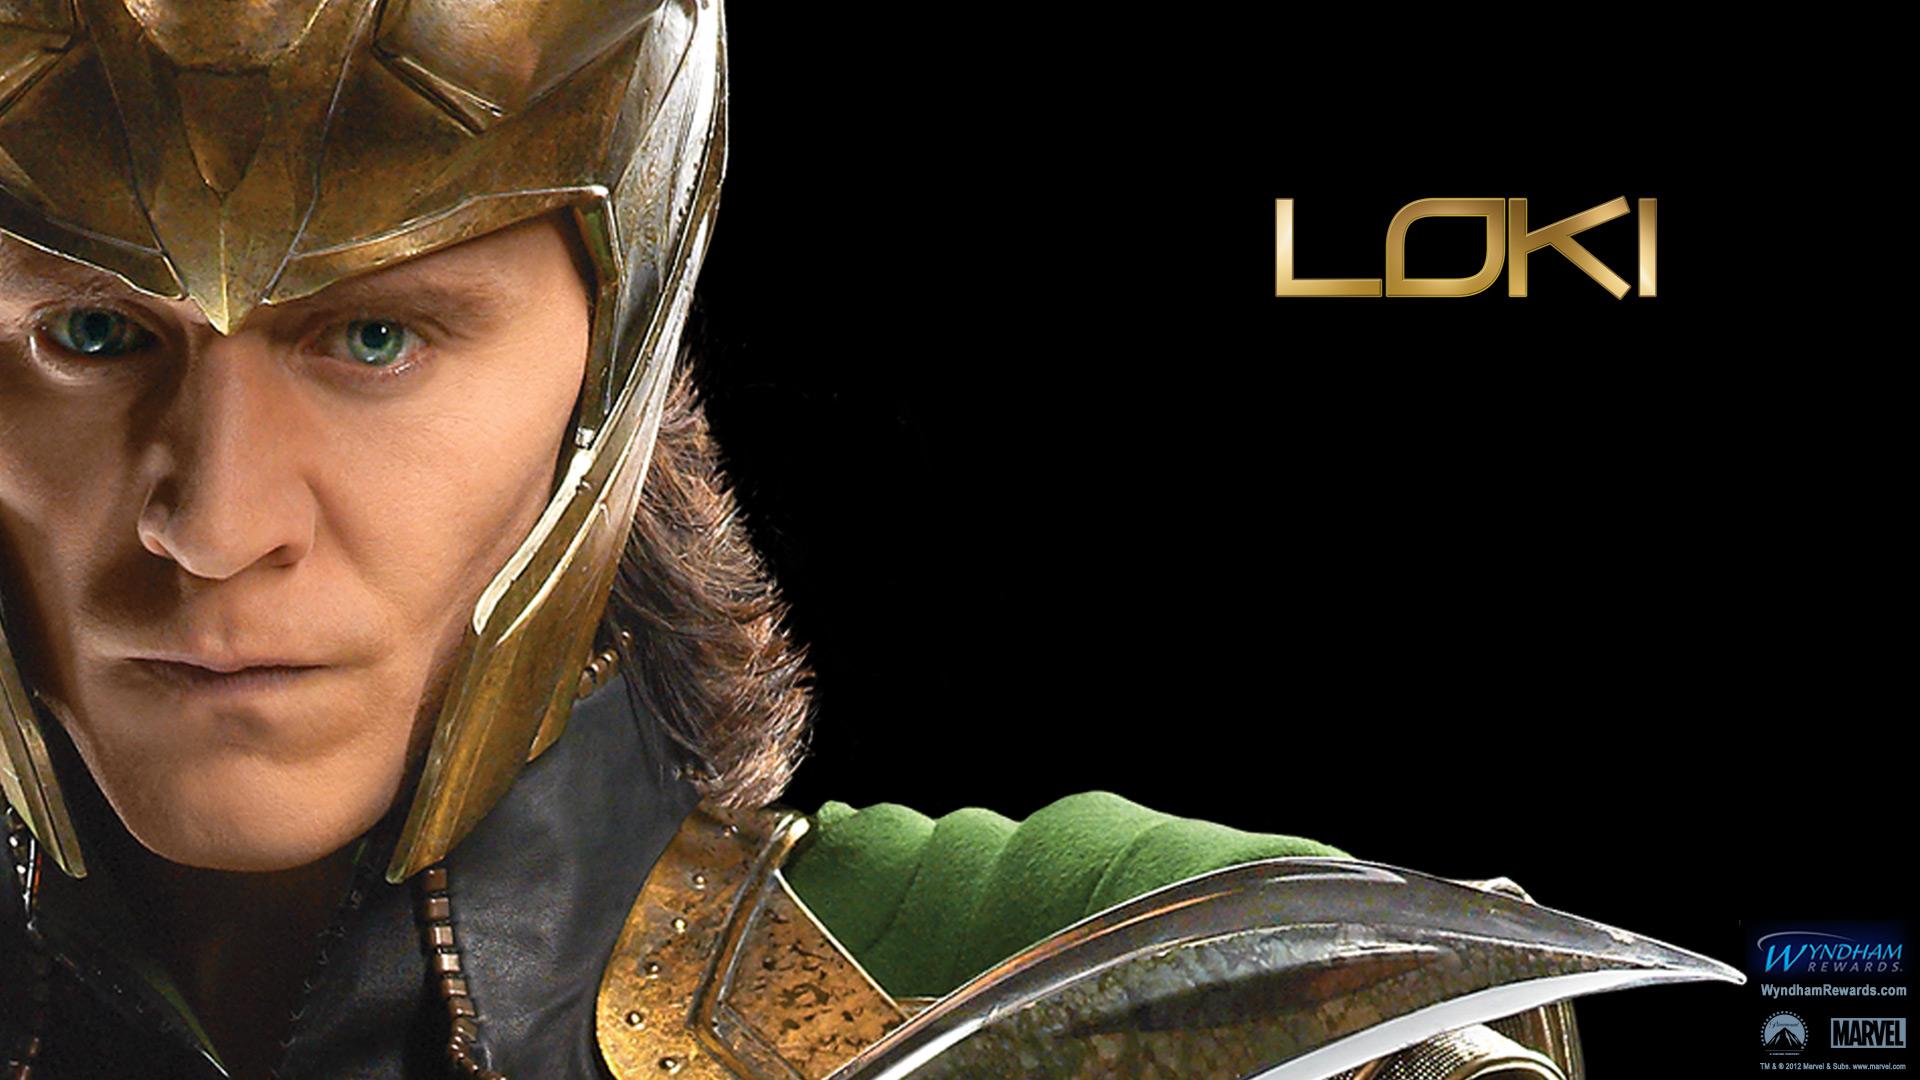 The Avengers images Loki wallpaper photos 30730359 1920x1080